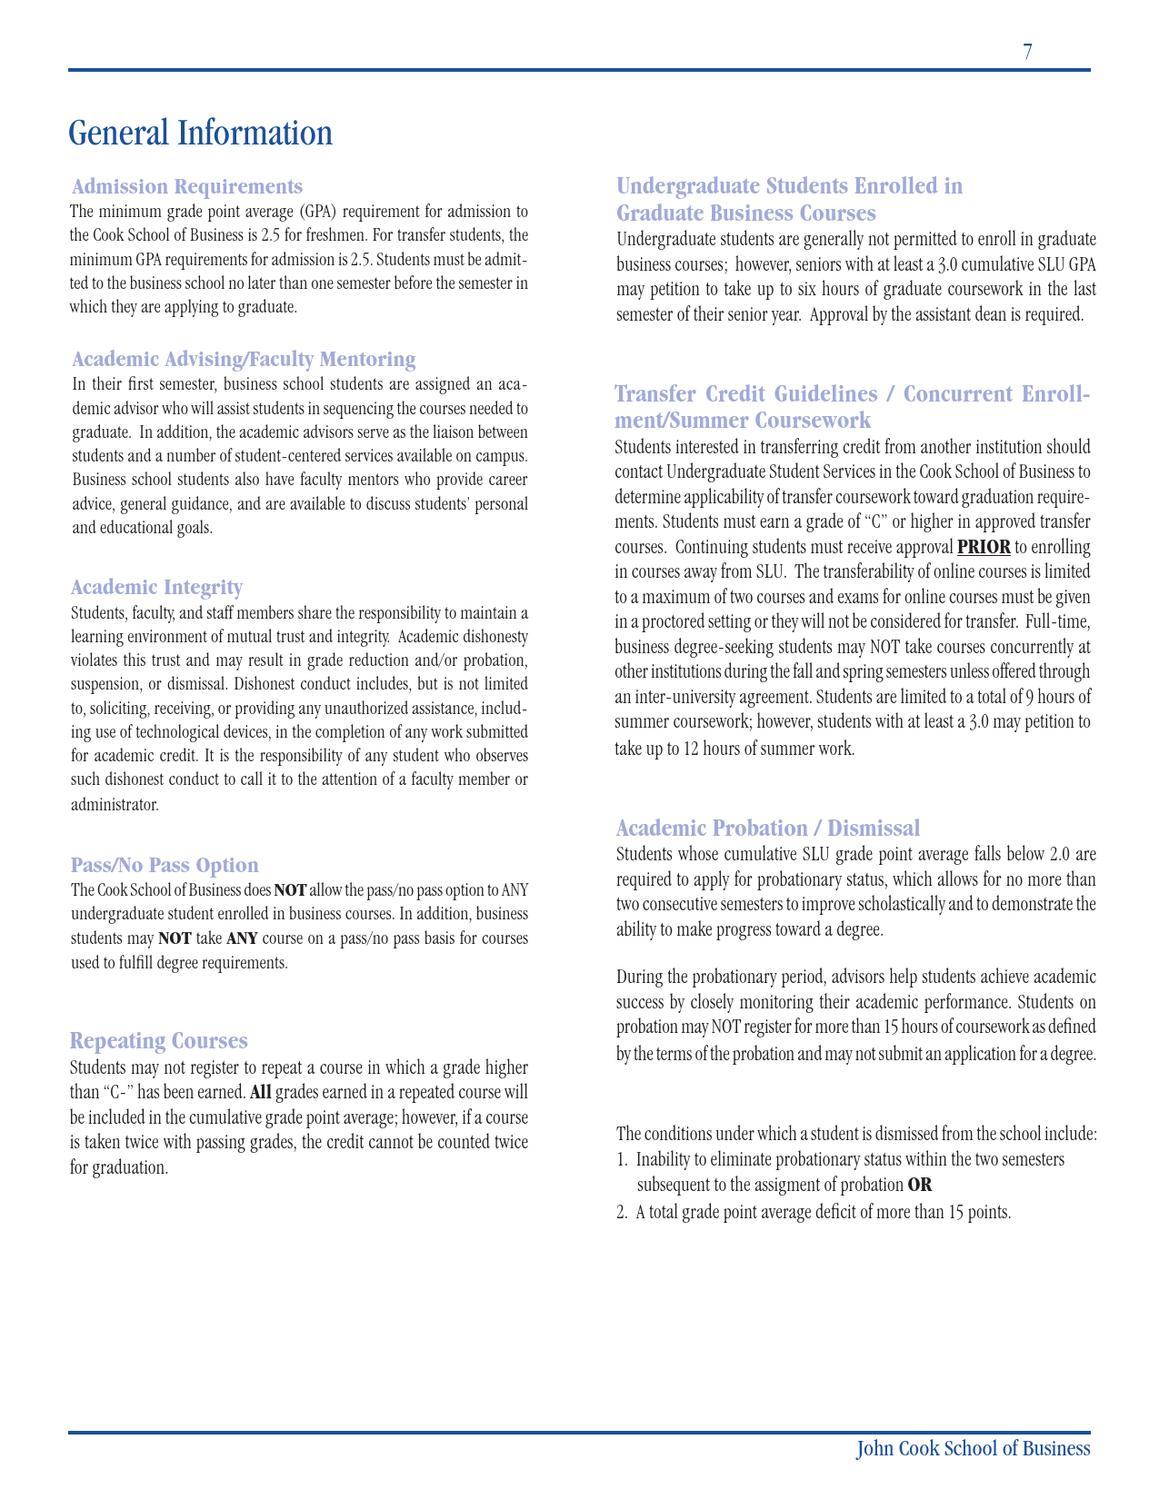 Cook School Undergraduate Business Program Book by Richard A